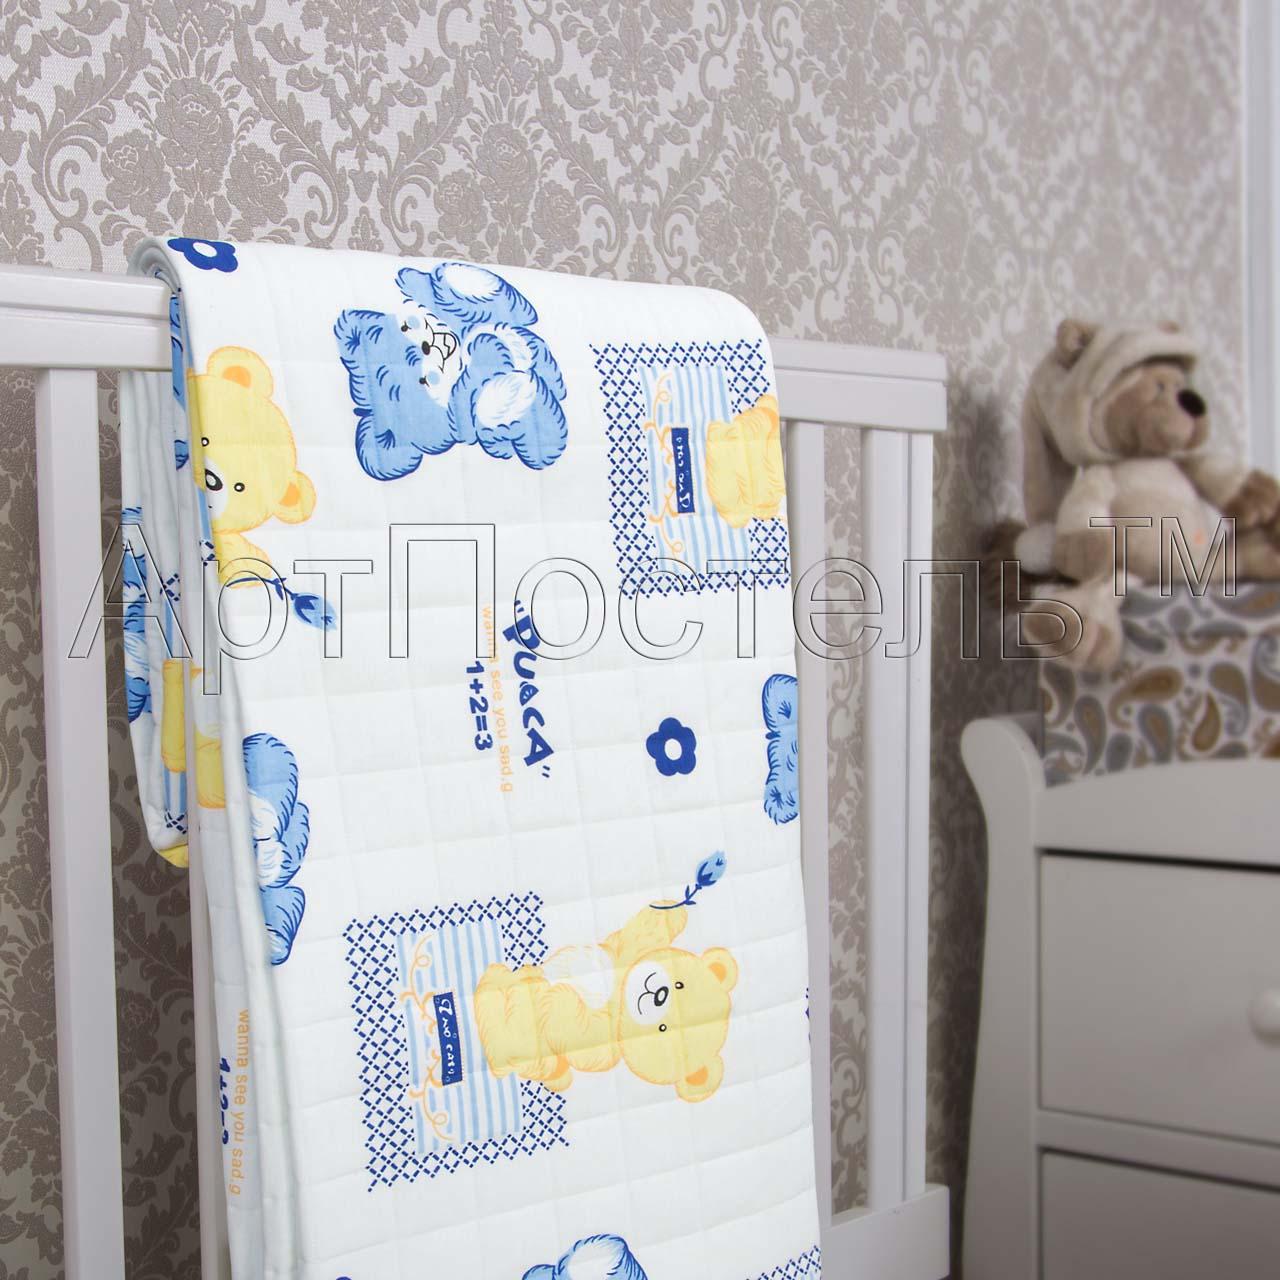 Покрывало  Медвежата  р. 140х200 - Текстиль для дома артикул: 33959